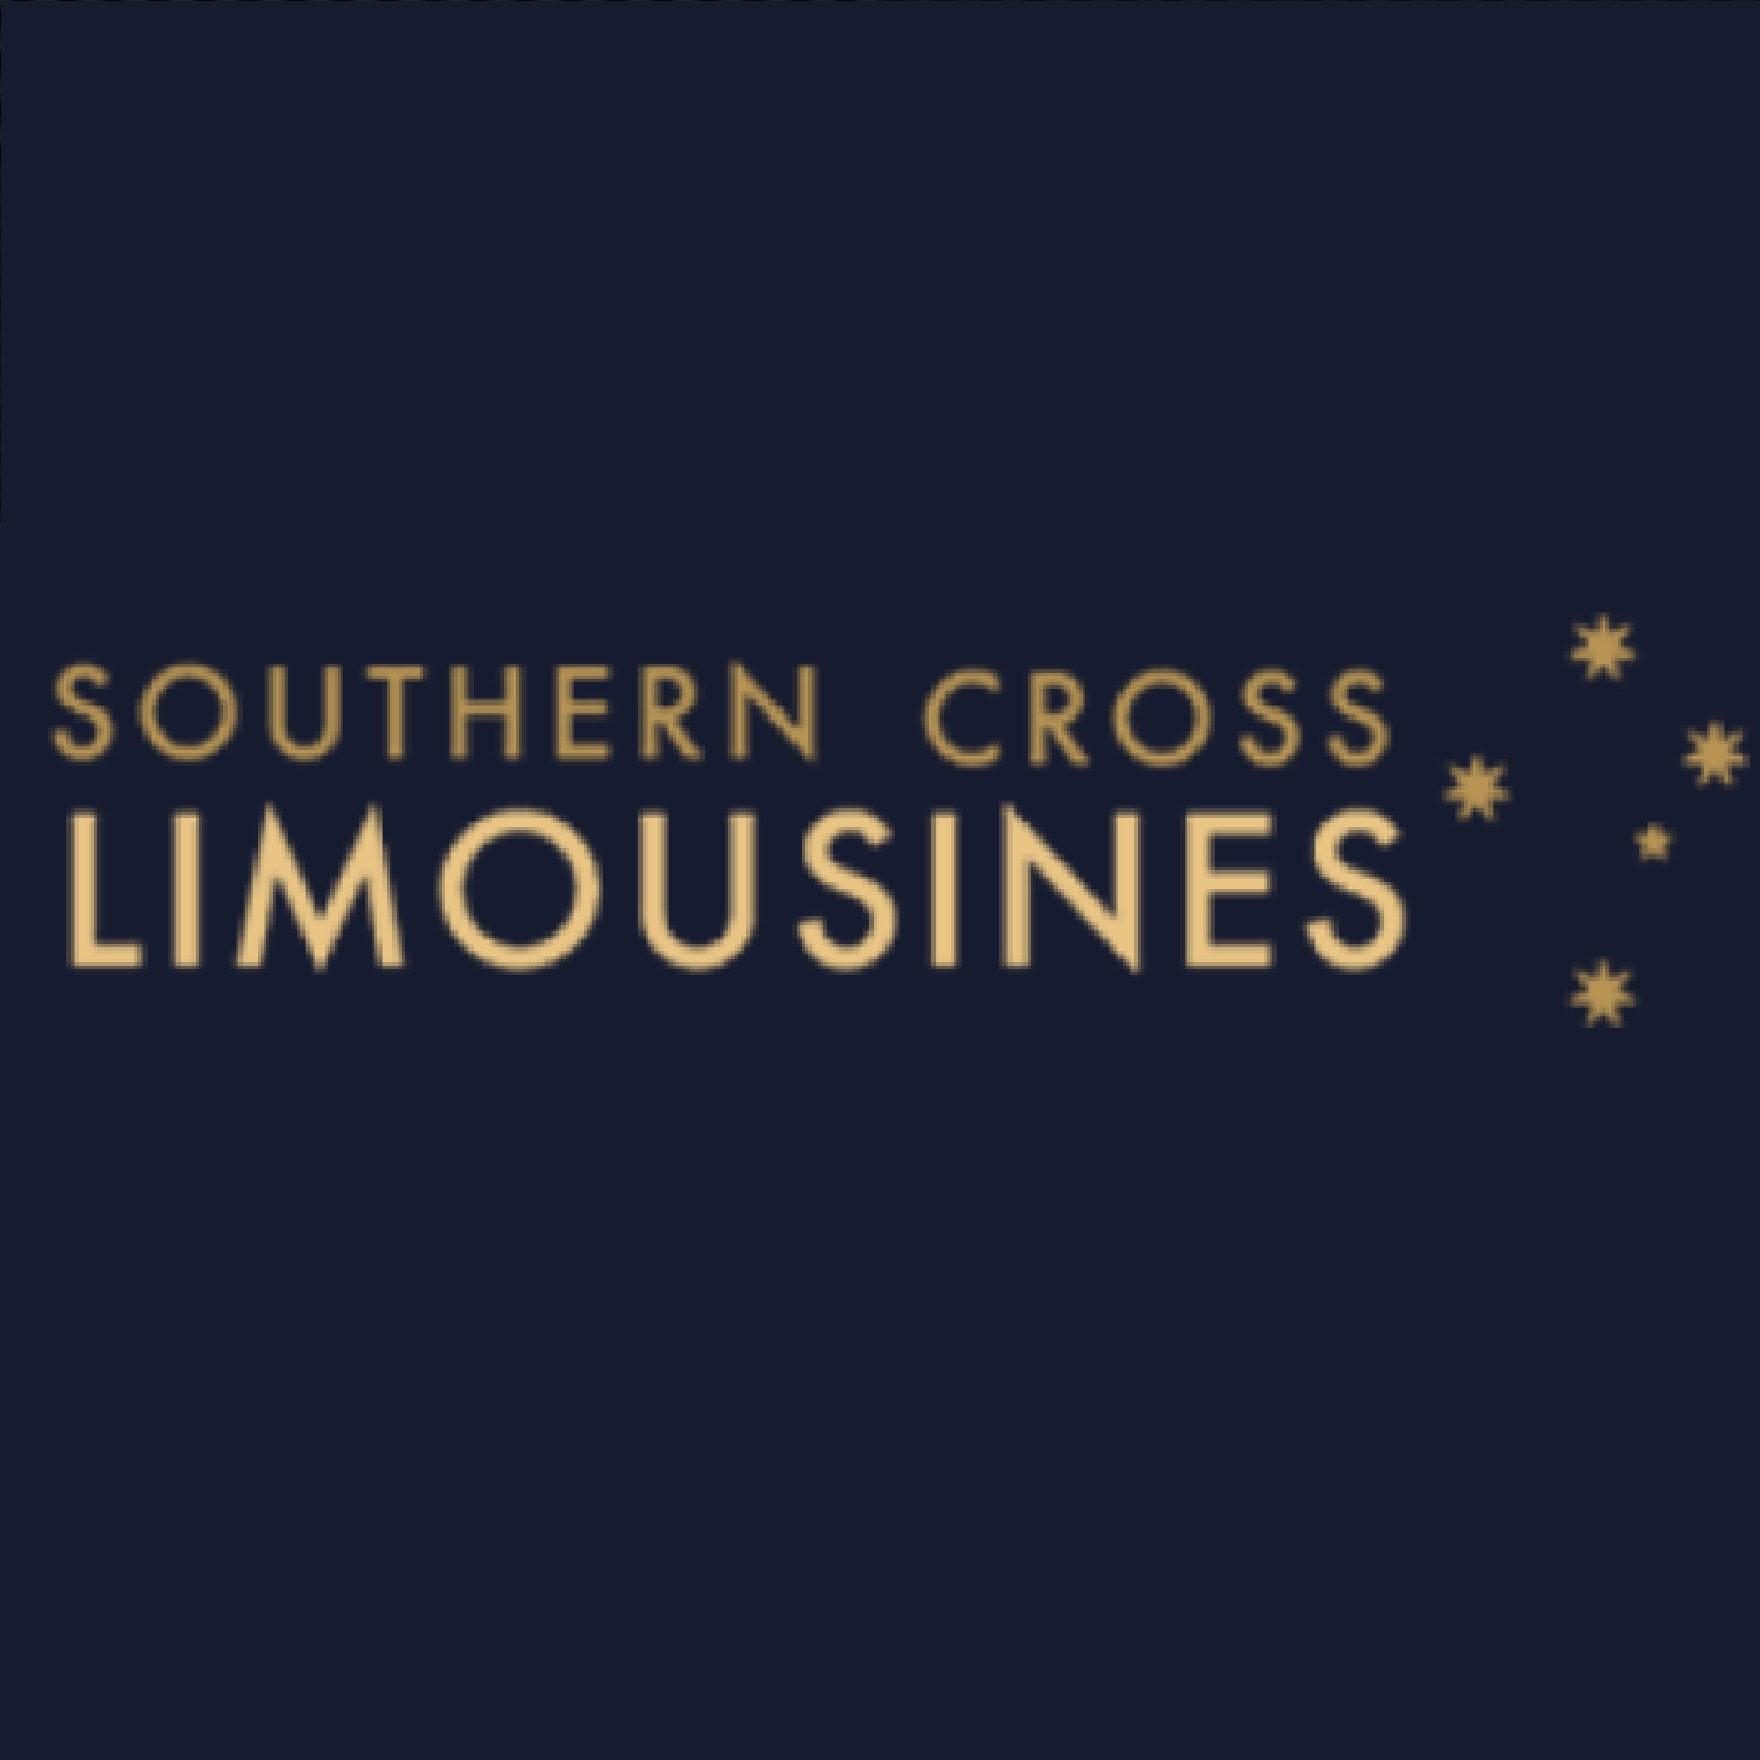 Southern Cross Limousine Cairns logo